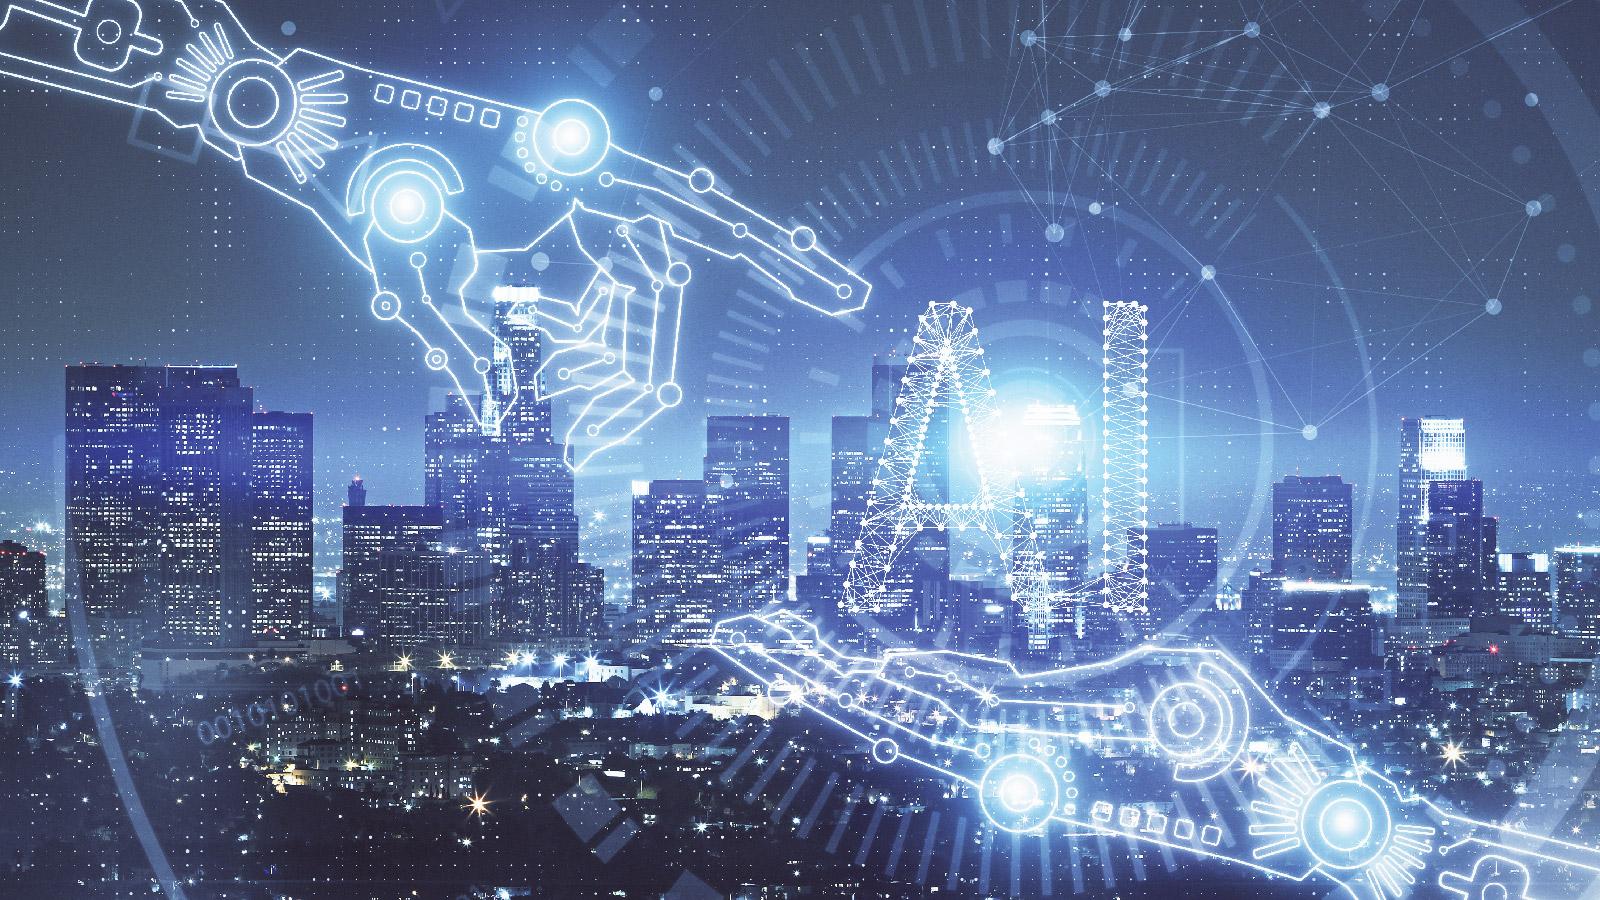 AI, Artificial intelligence, disruption in urban centers, broad technological and digital disruption, CEO, CIO